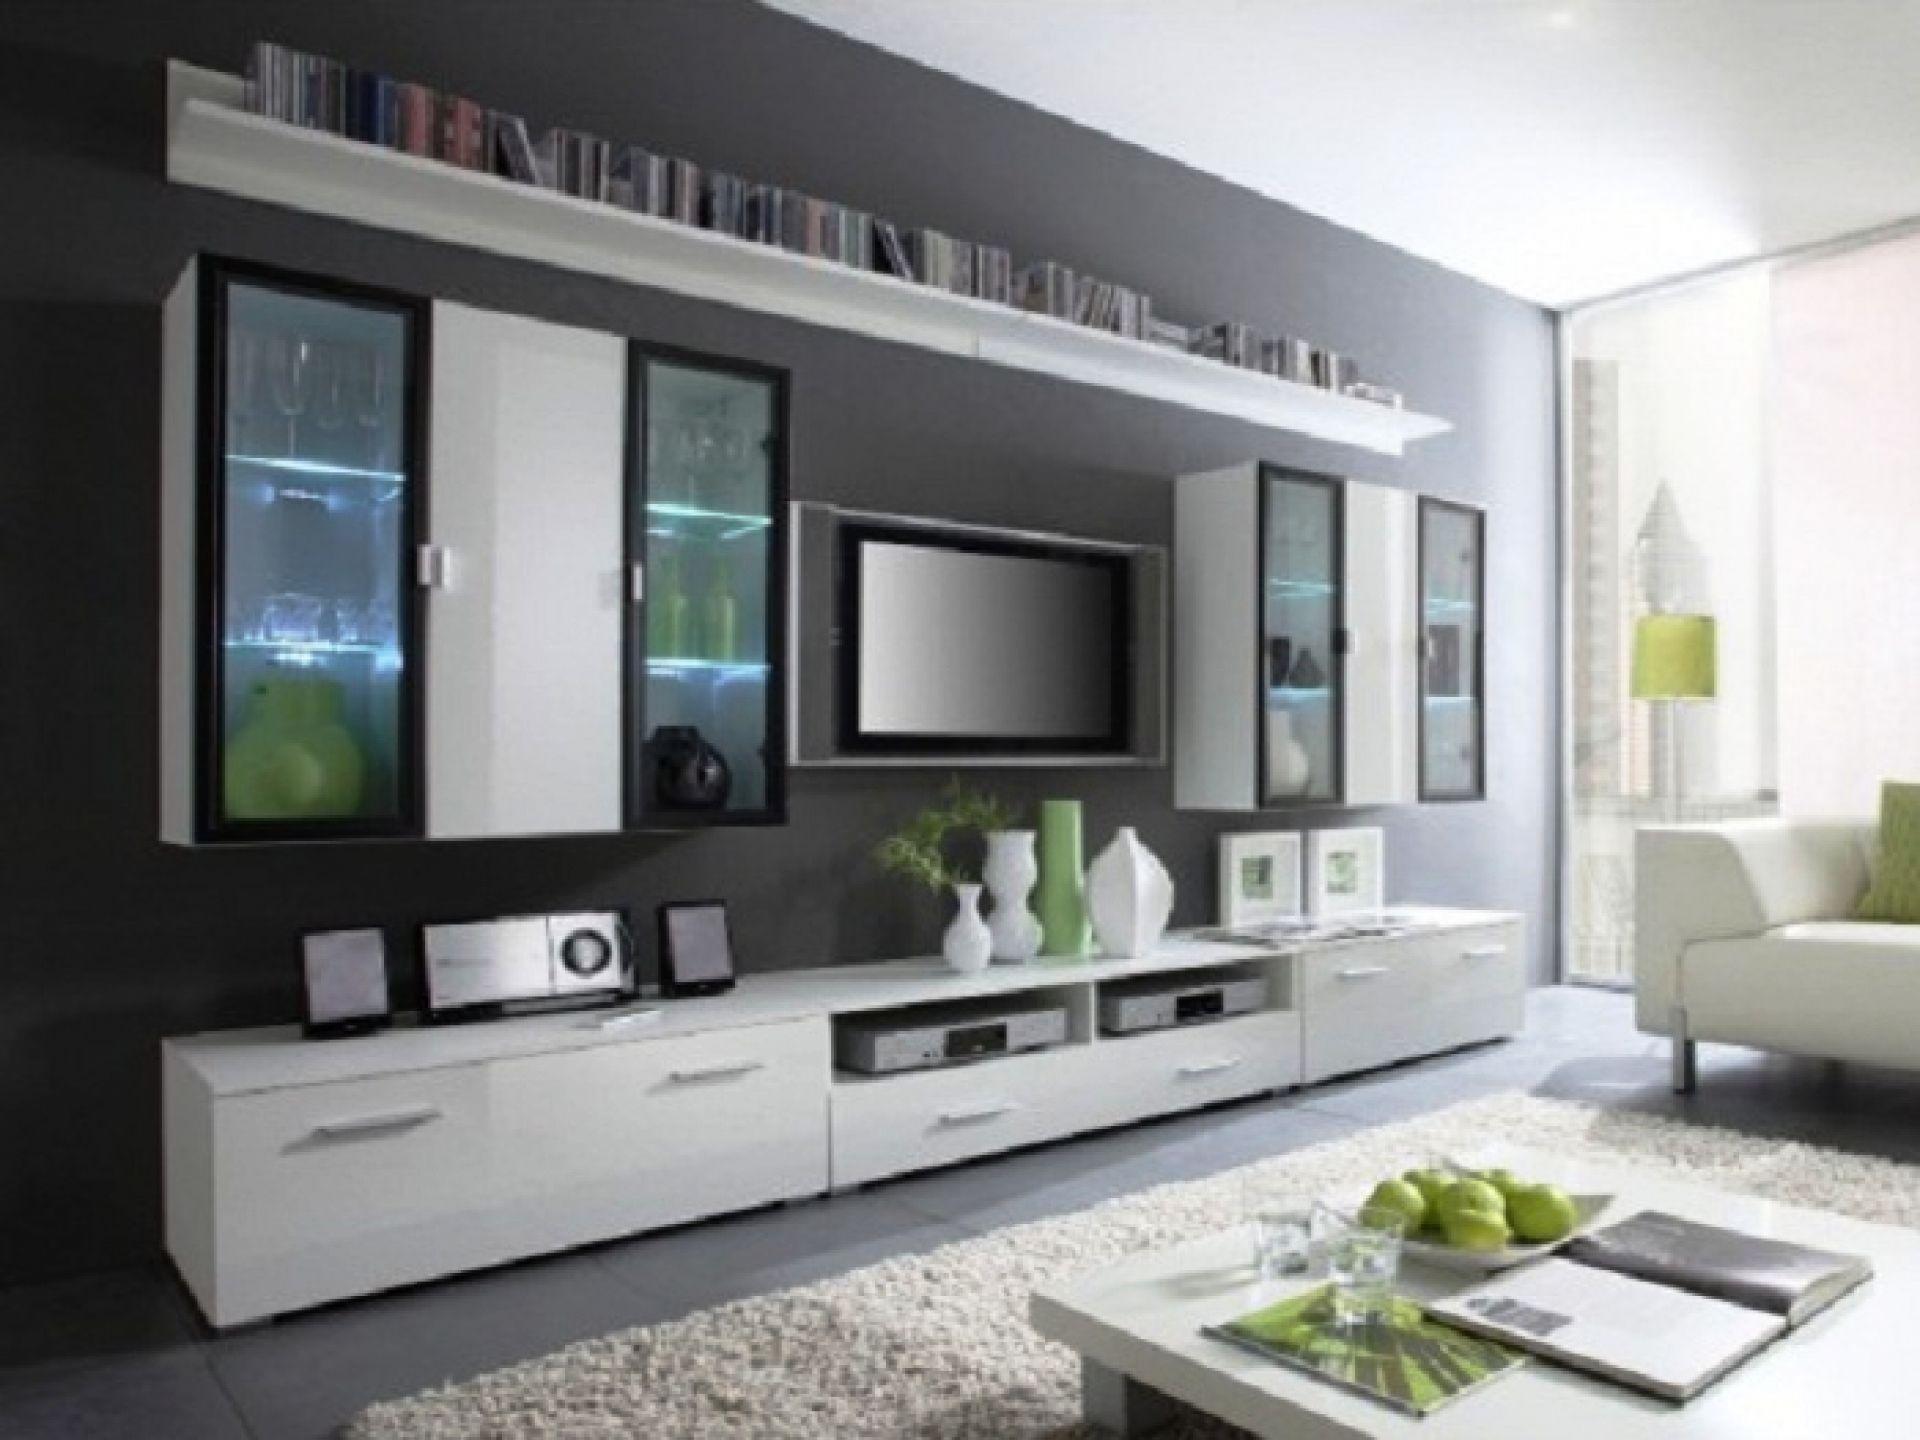 40 TV Wall Decor Ideas Decoholic Tv Wall Decor Wall Shelves